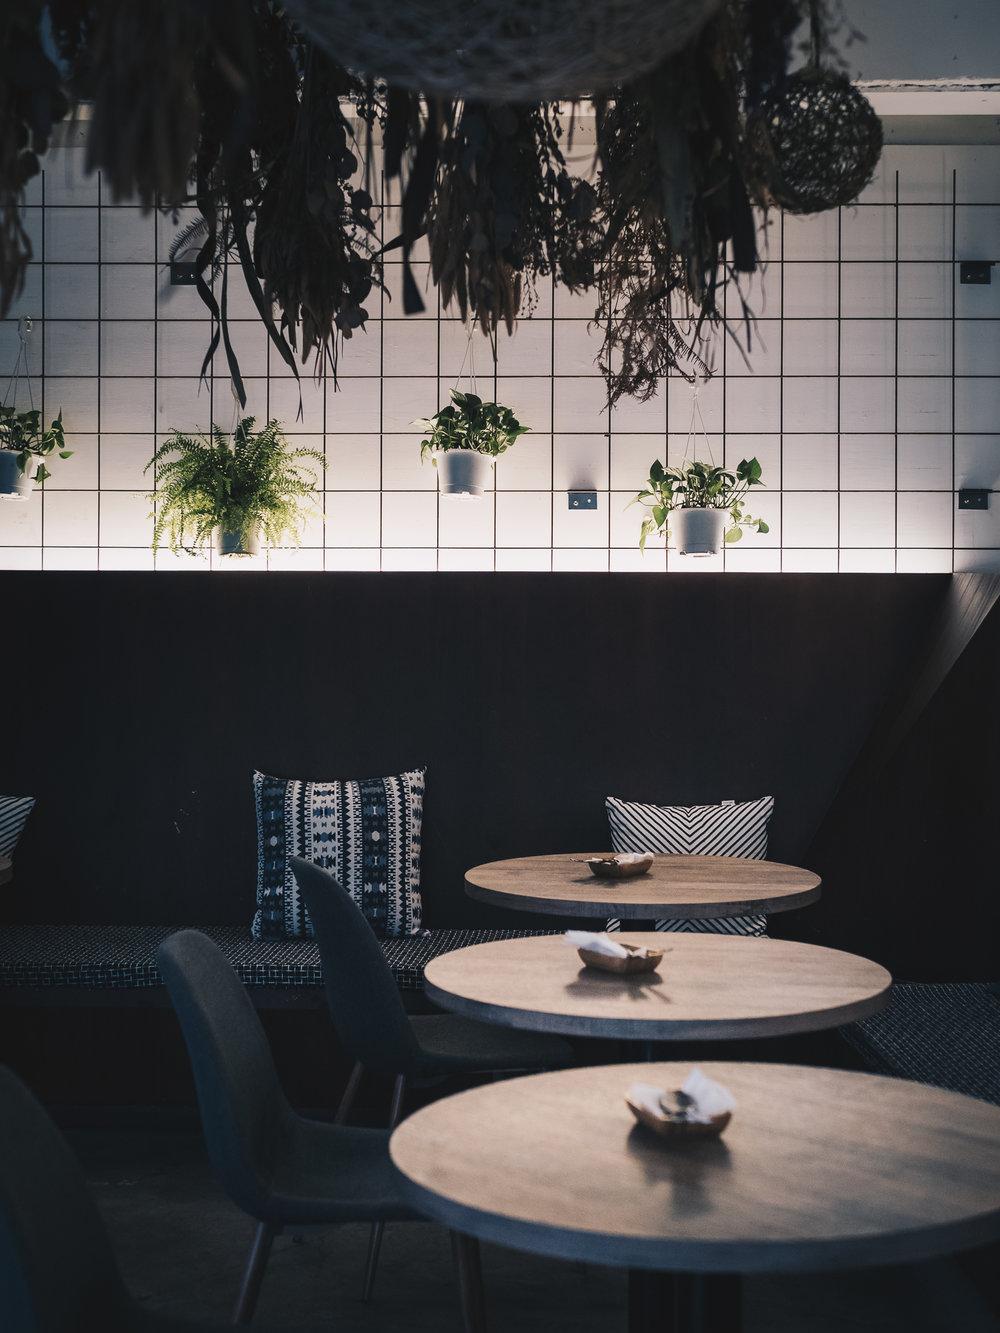 Miss Green Vegan Restaurant Taipei - 10-10 Hope - Olympus E-M1Markii 2512 - Yes! Please Enjoy.jpg